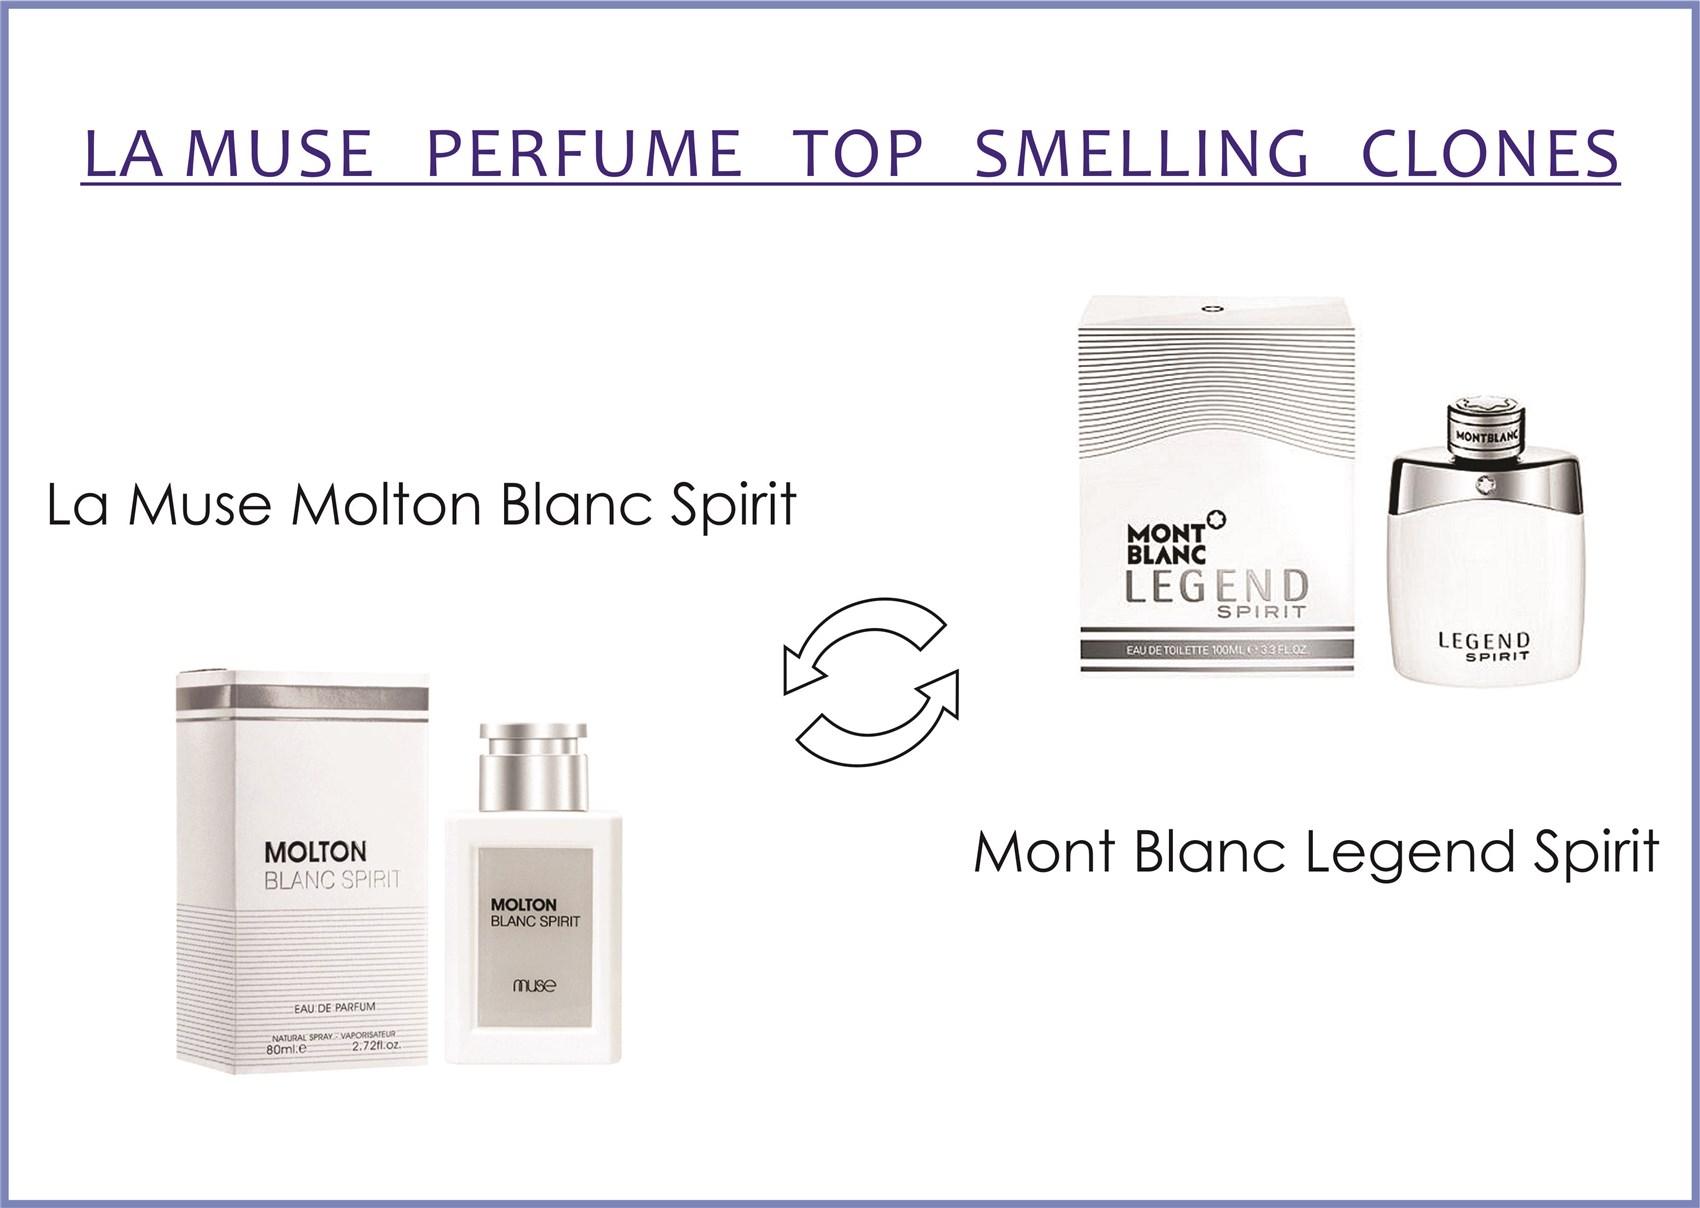 mont-blanc-legend-spirit-perfume-for-men-100-ml-edt-la-muse-molton-blanc-spirit-perfume